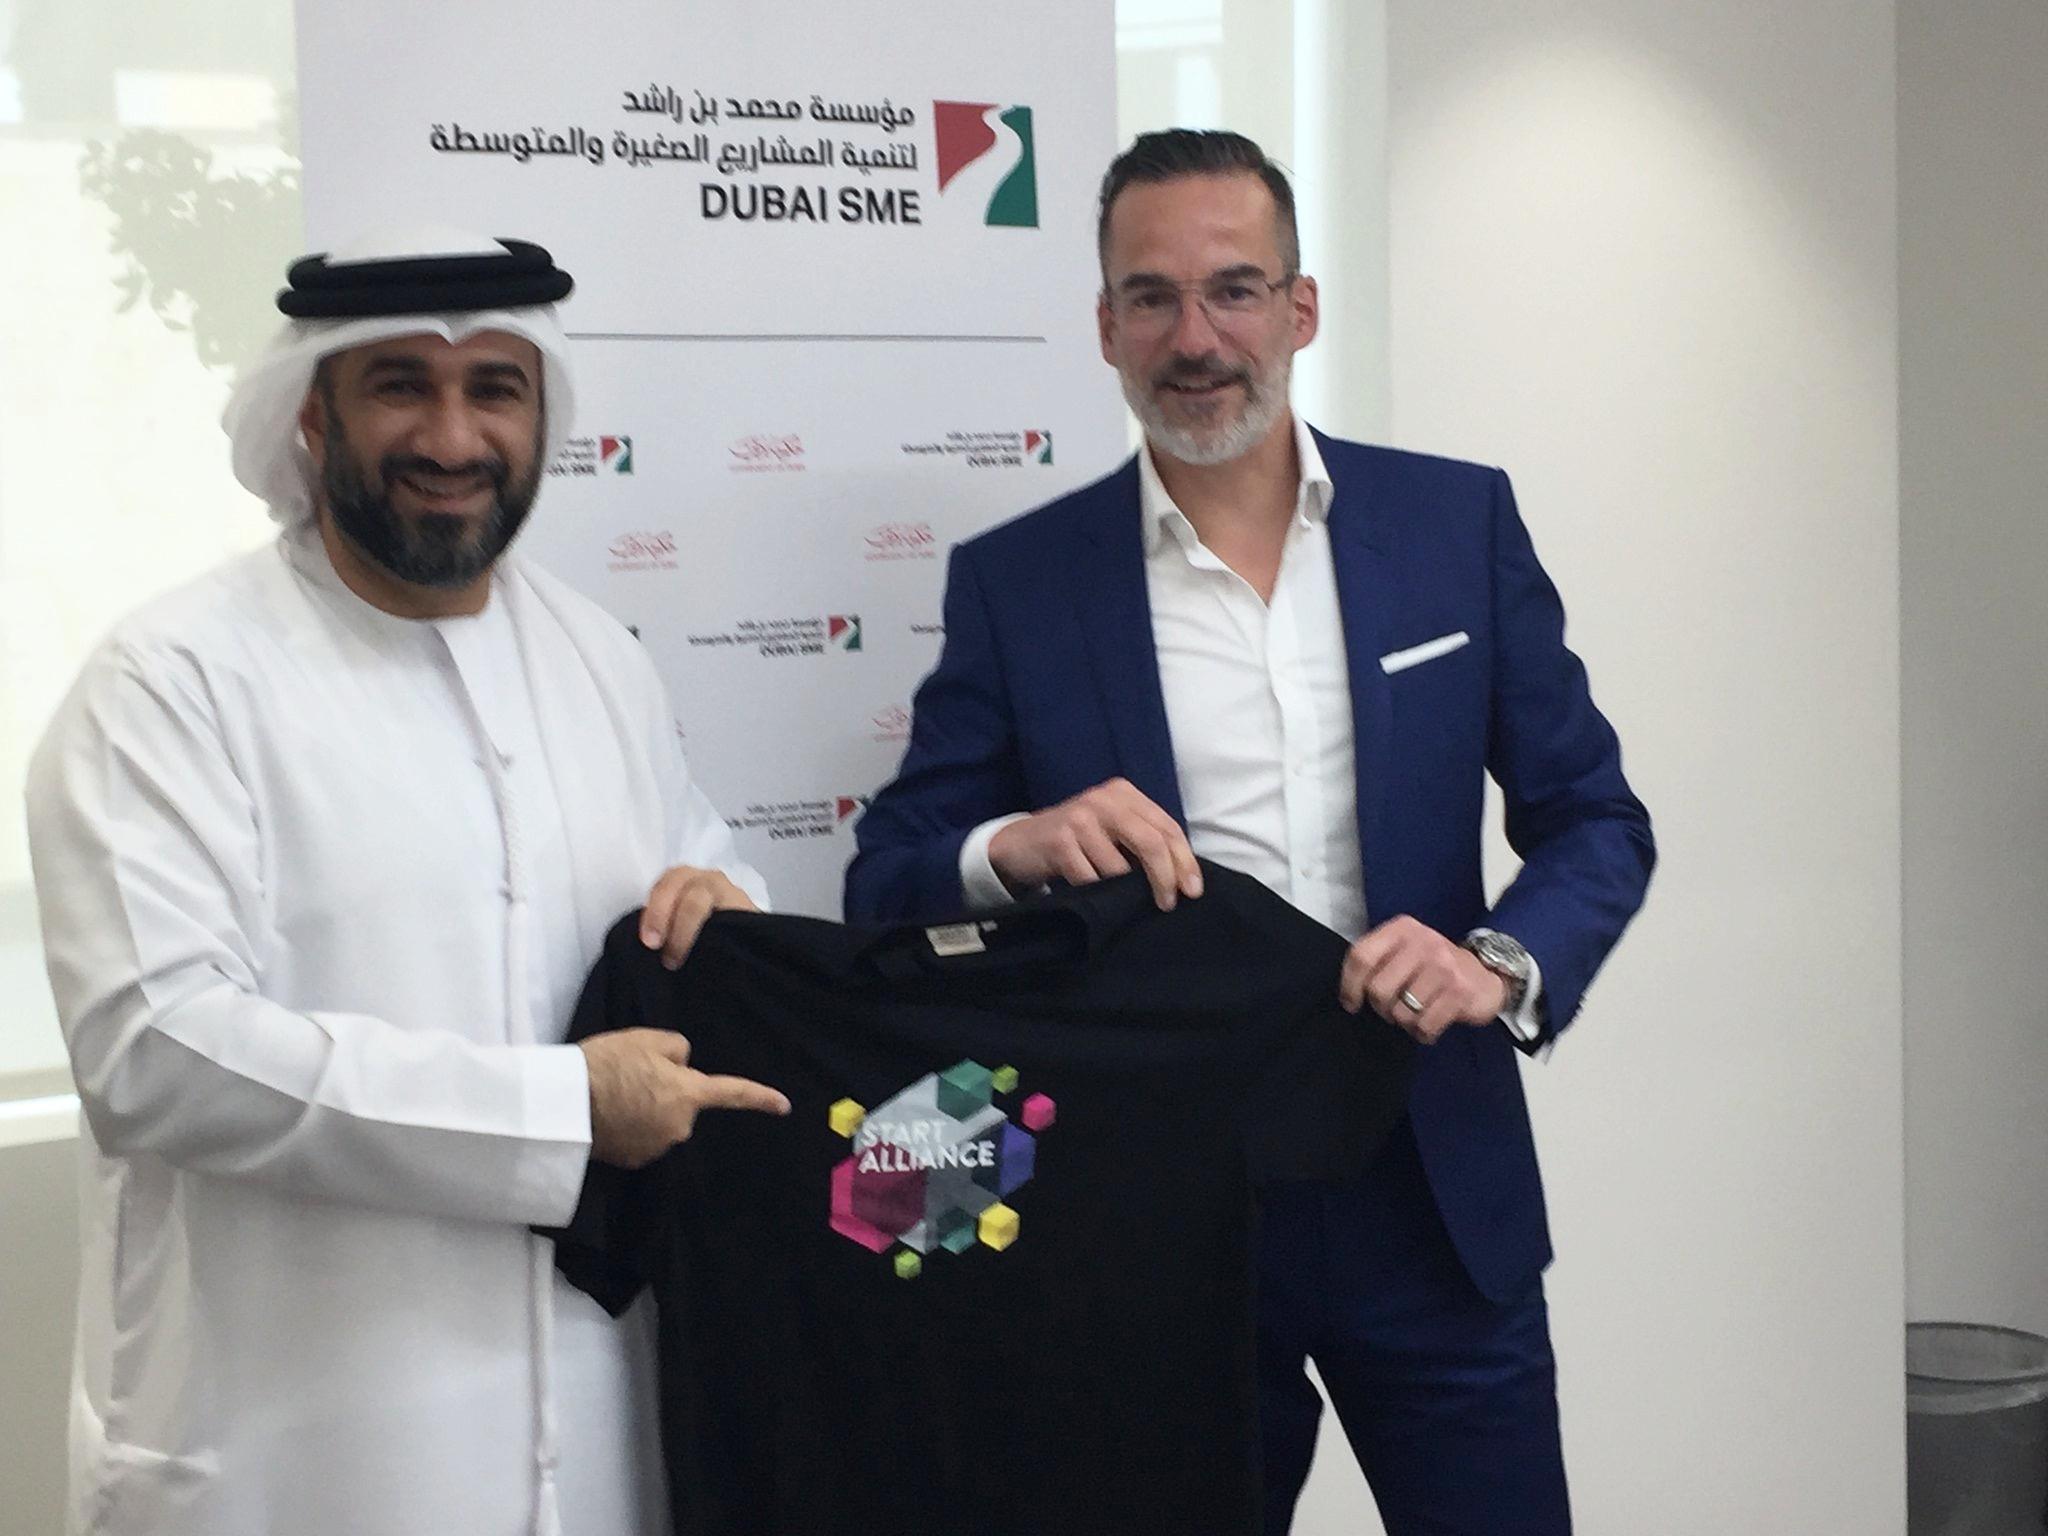 Abdul Basset Al Janahi (CEO, Dubai SME) and Dr. Stefan Franzke (CEO, Berlin Partner)